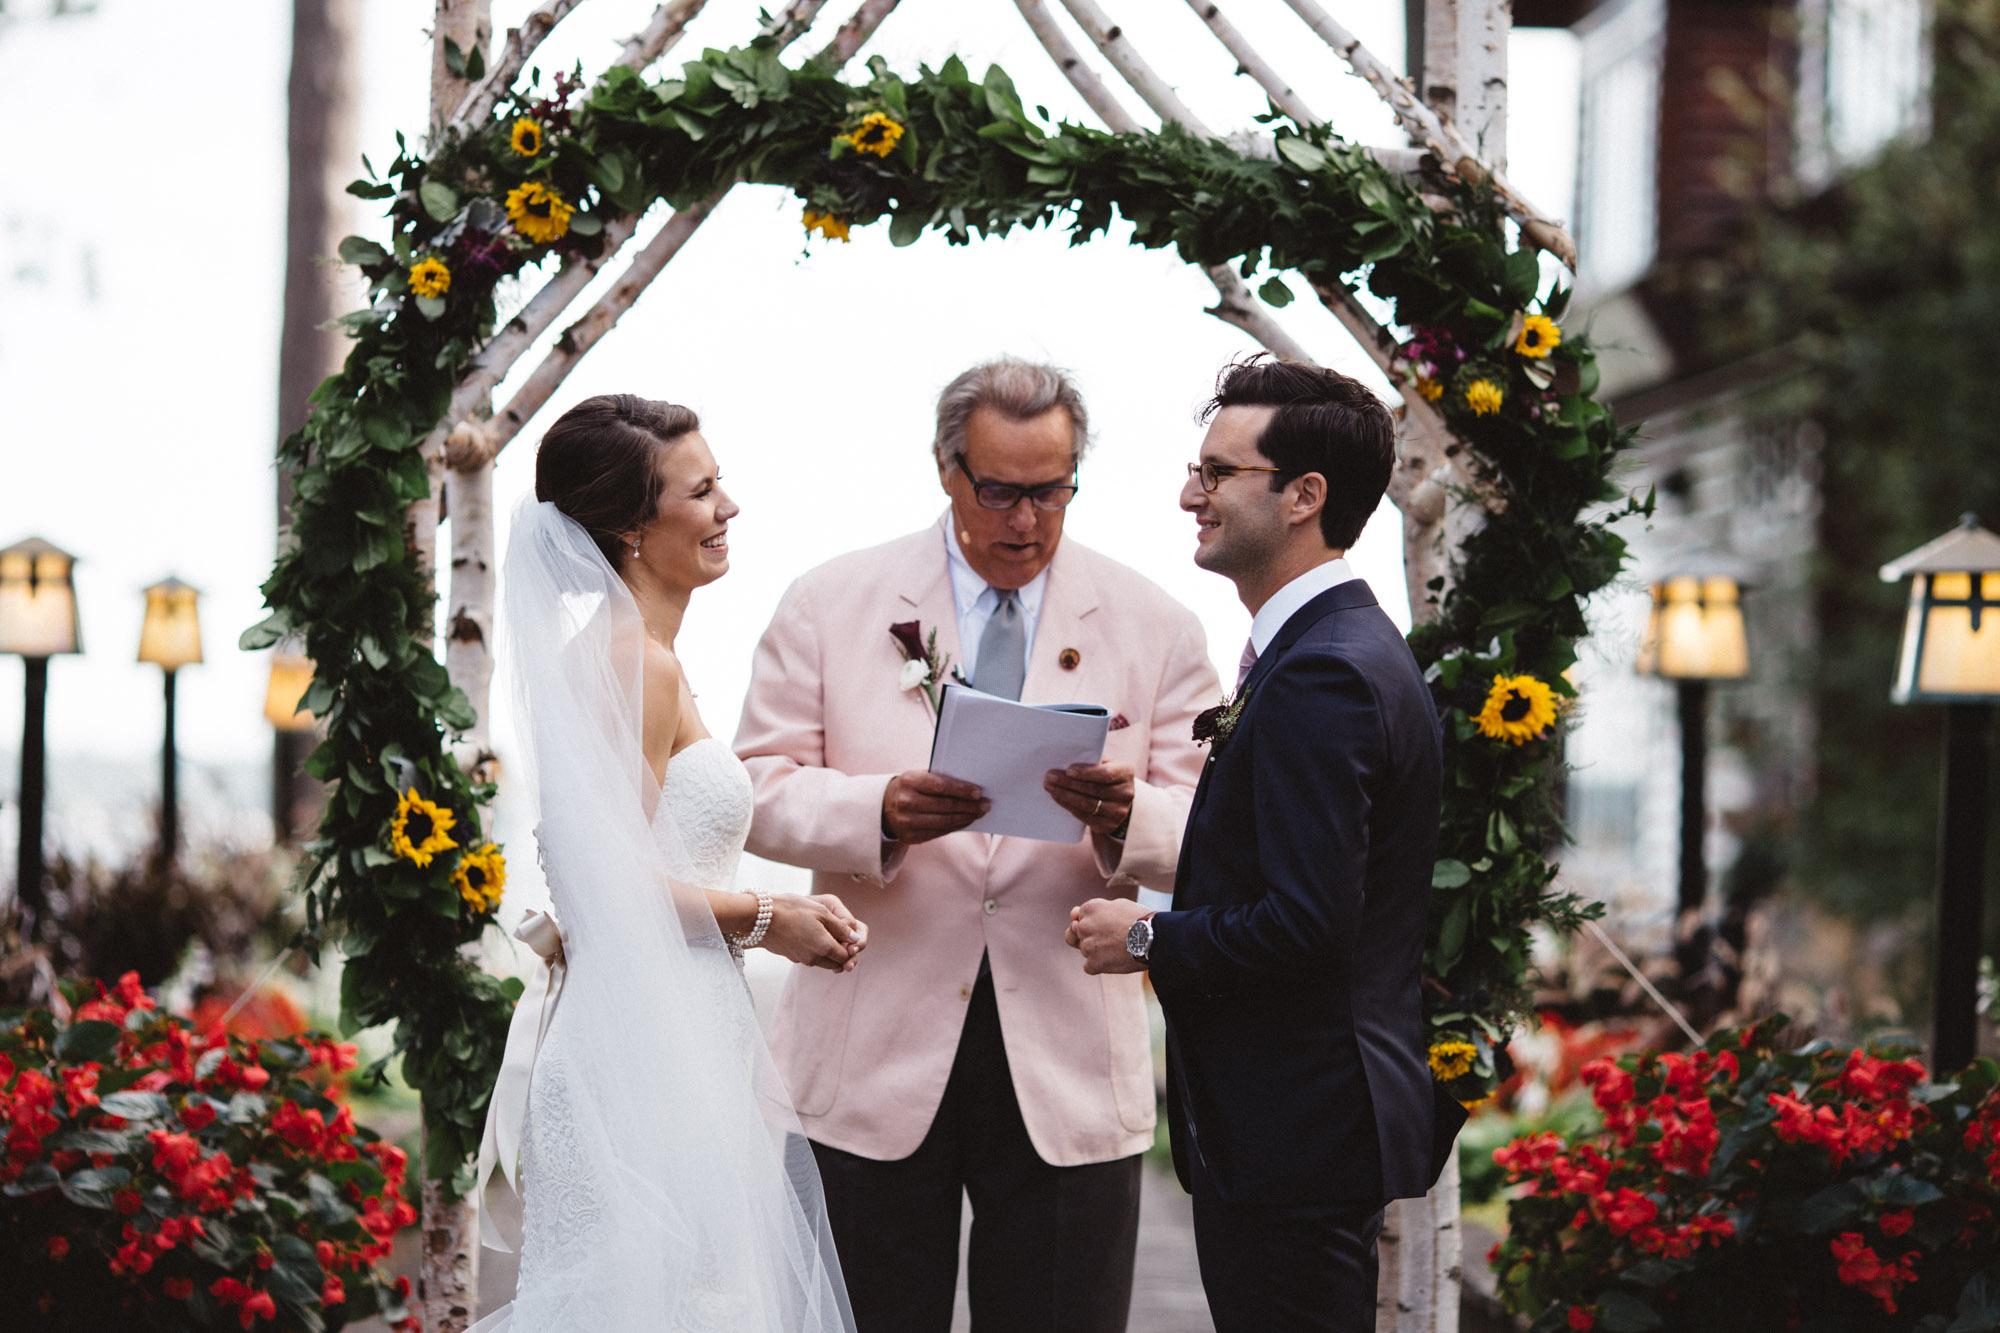 Grand View Lodge wedding photography by Britt DeZeeuw, Brainerd Minnesota fine art photographer